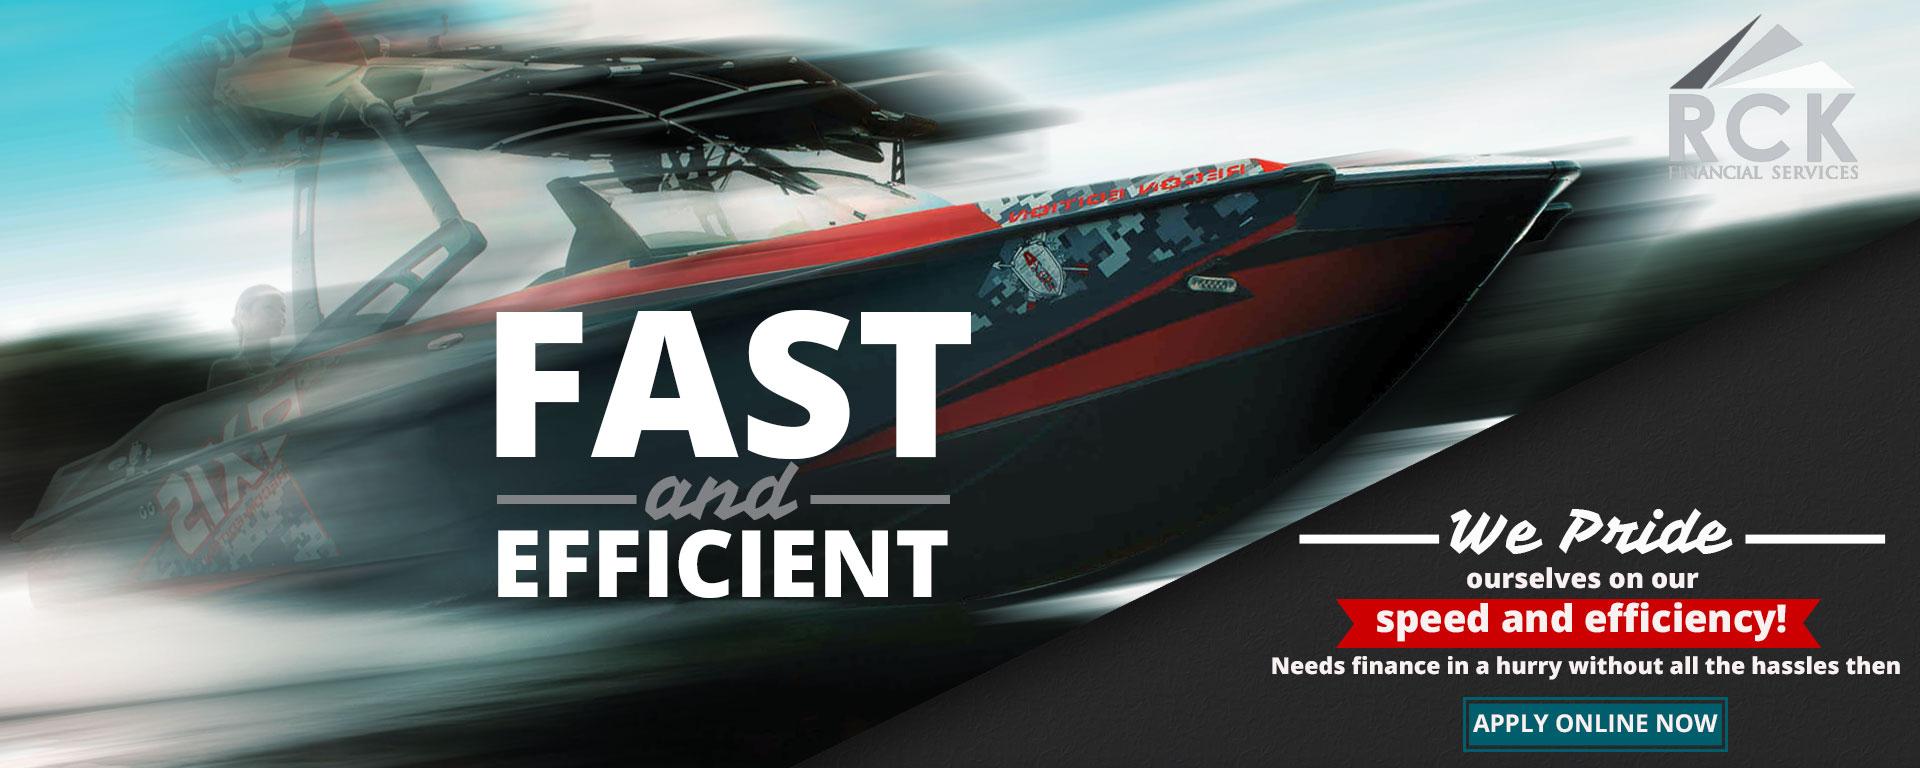 Fast-&-Efficient3.jpg